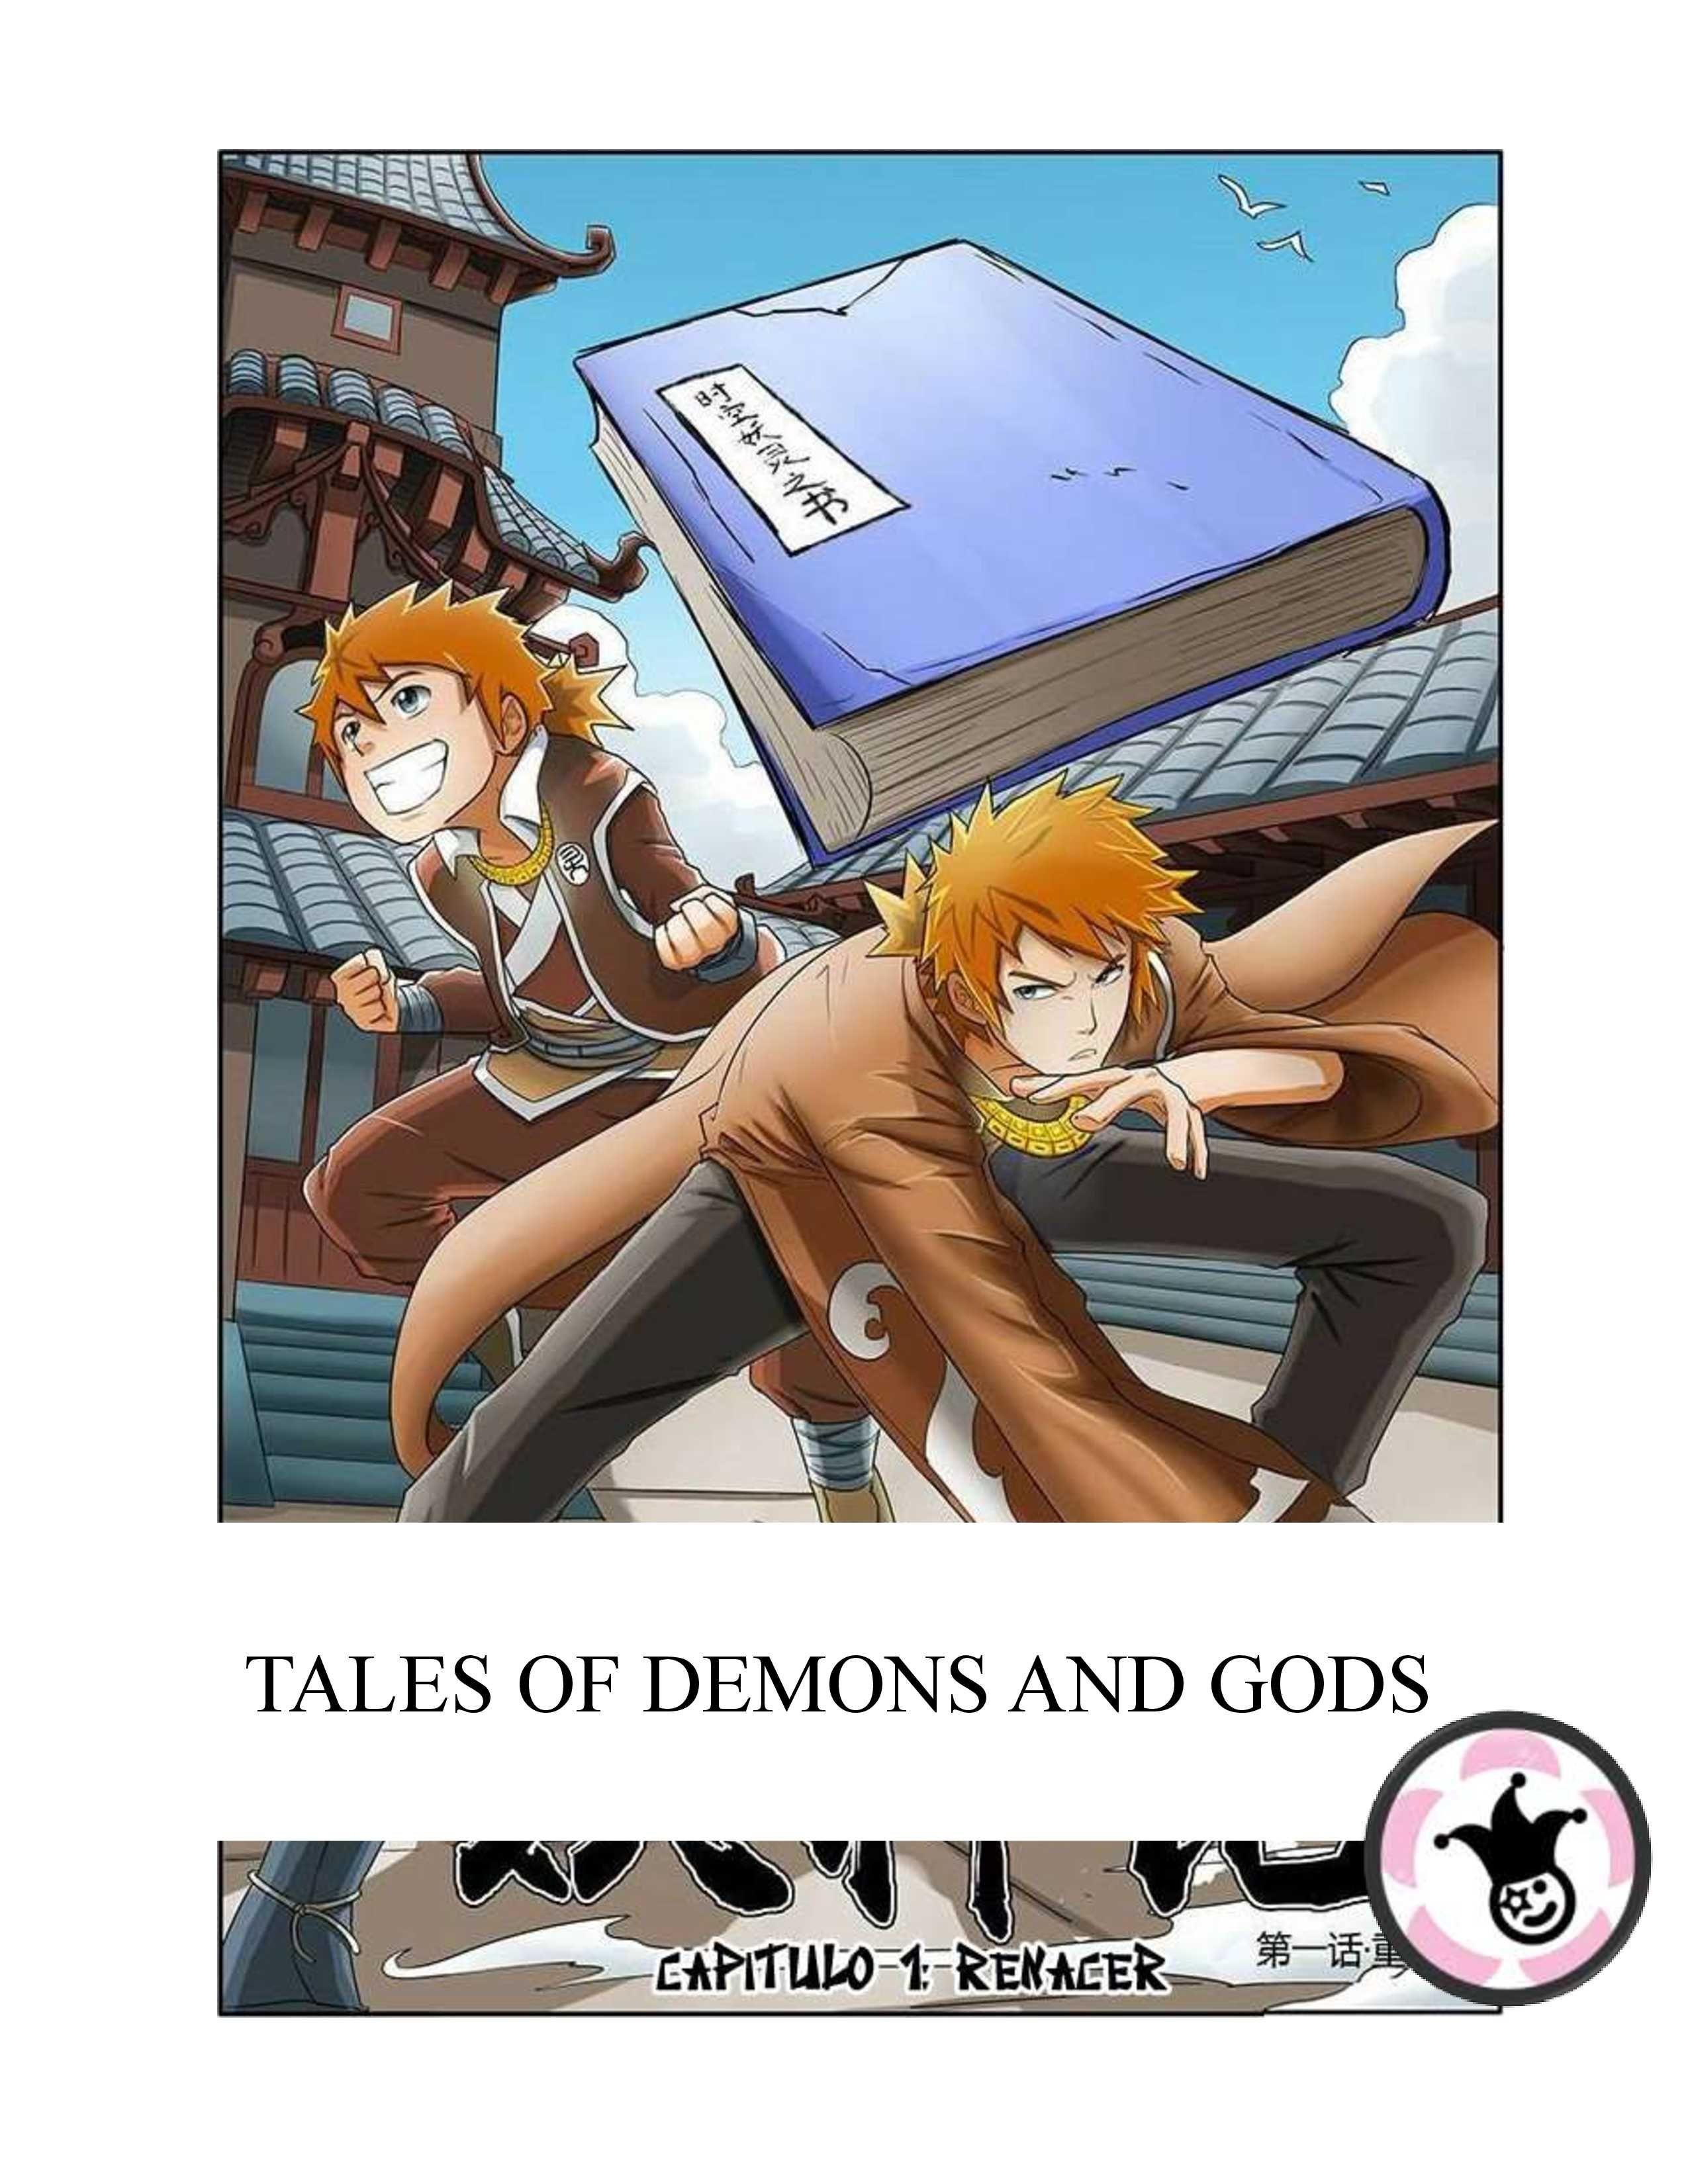 https://c5.ninemanga.com/es_manga/44/20012/484377/2c78dba45c7da902971f82865b9f7862.jpg Page 1